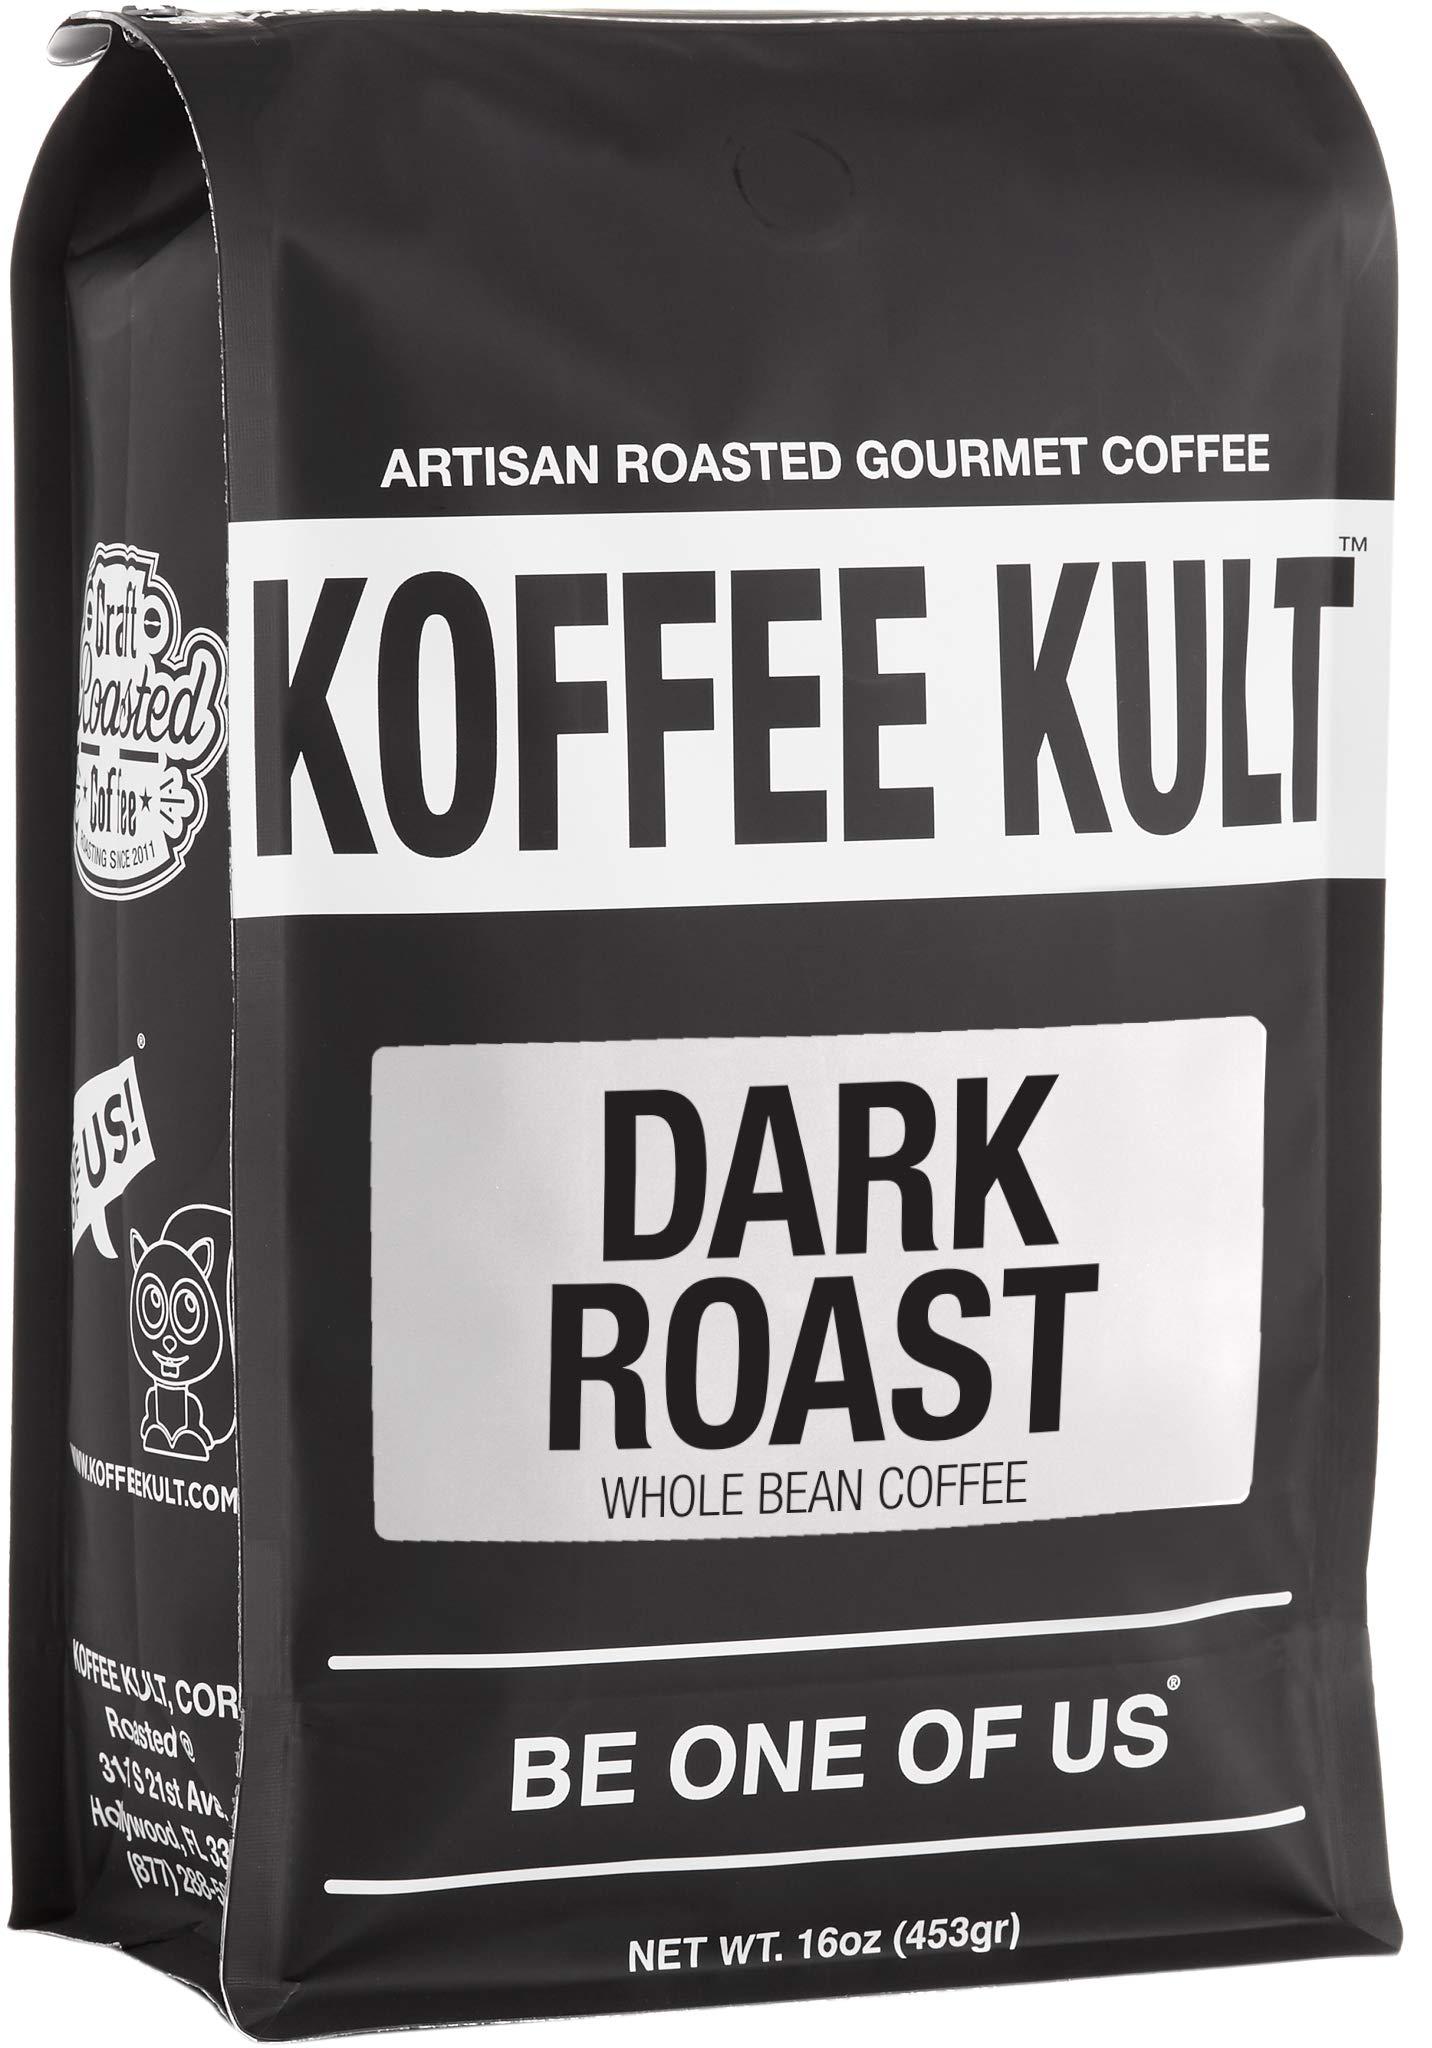 Koffee Kult DARK ROAST COFFEE (16oz) Highest Quality Delicious Specialty Grade Whole Bean Coffee - Fresh Gourmet Aromatic Artisan Blend by Koffee Kult